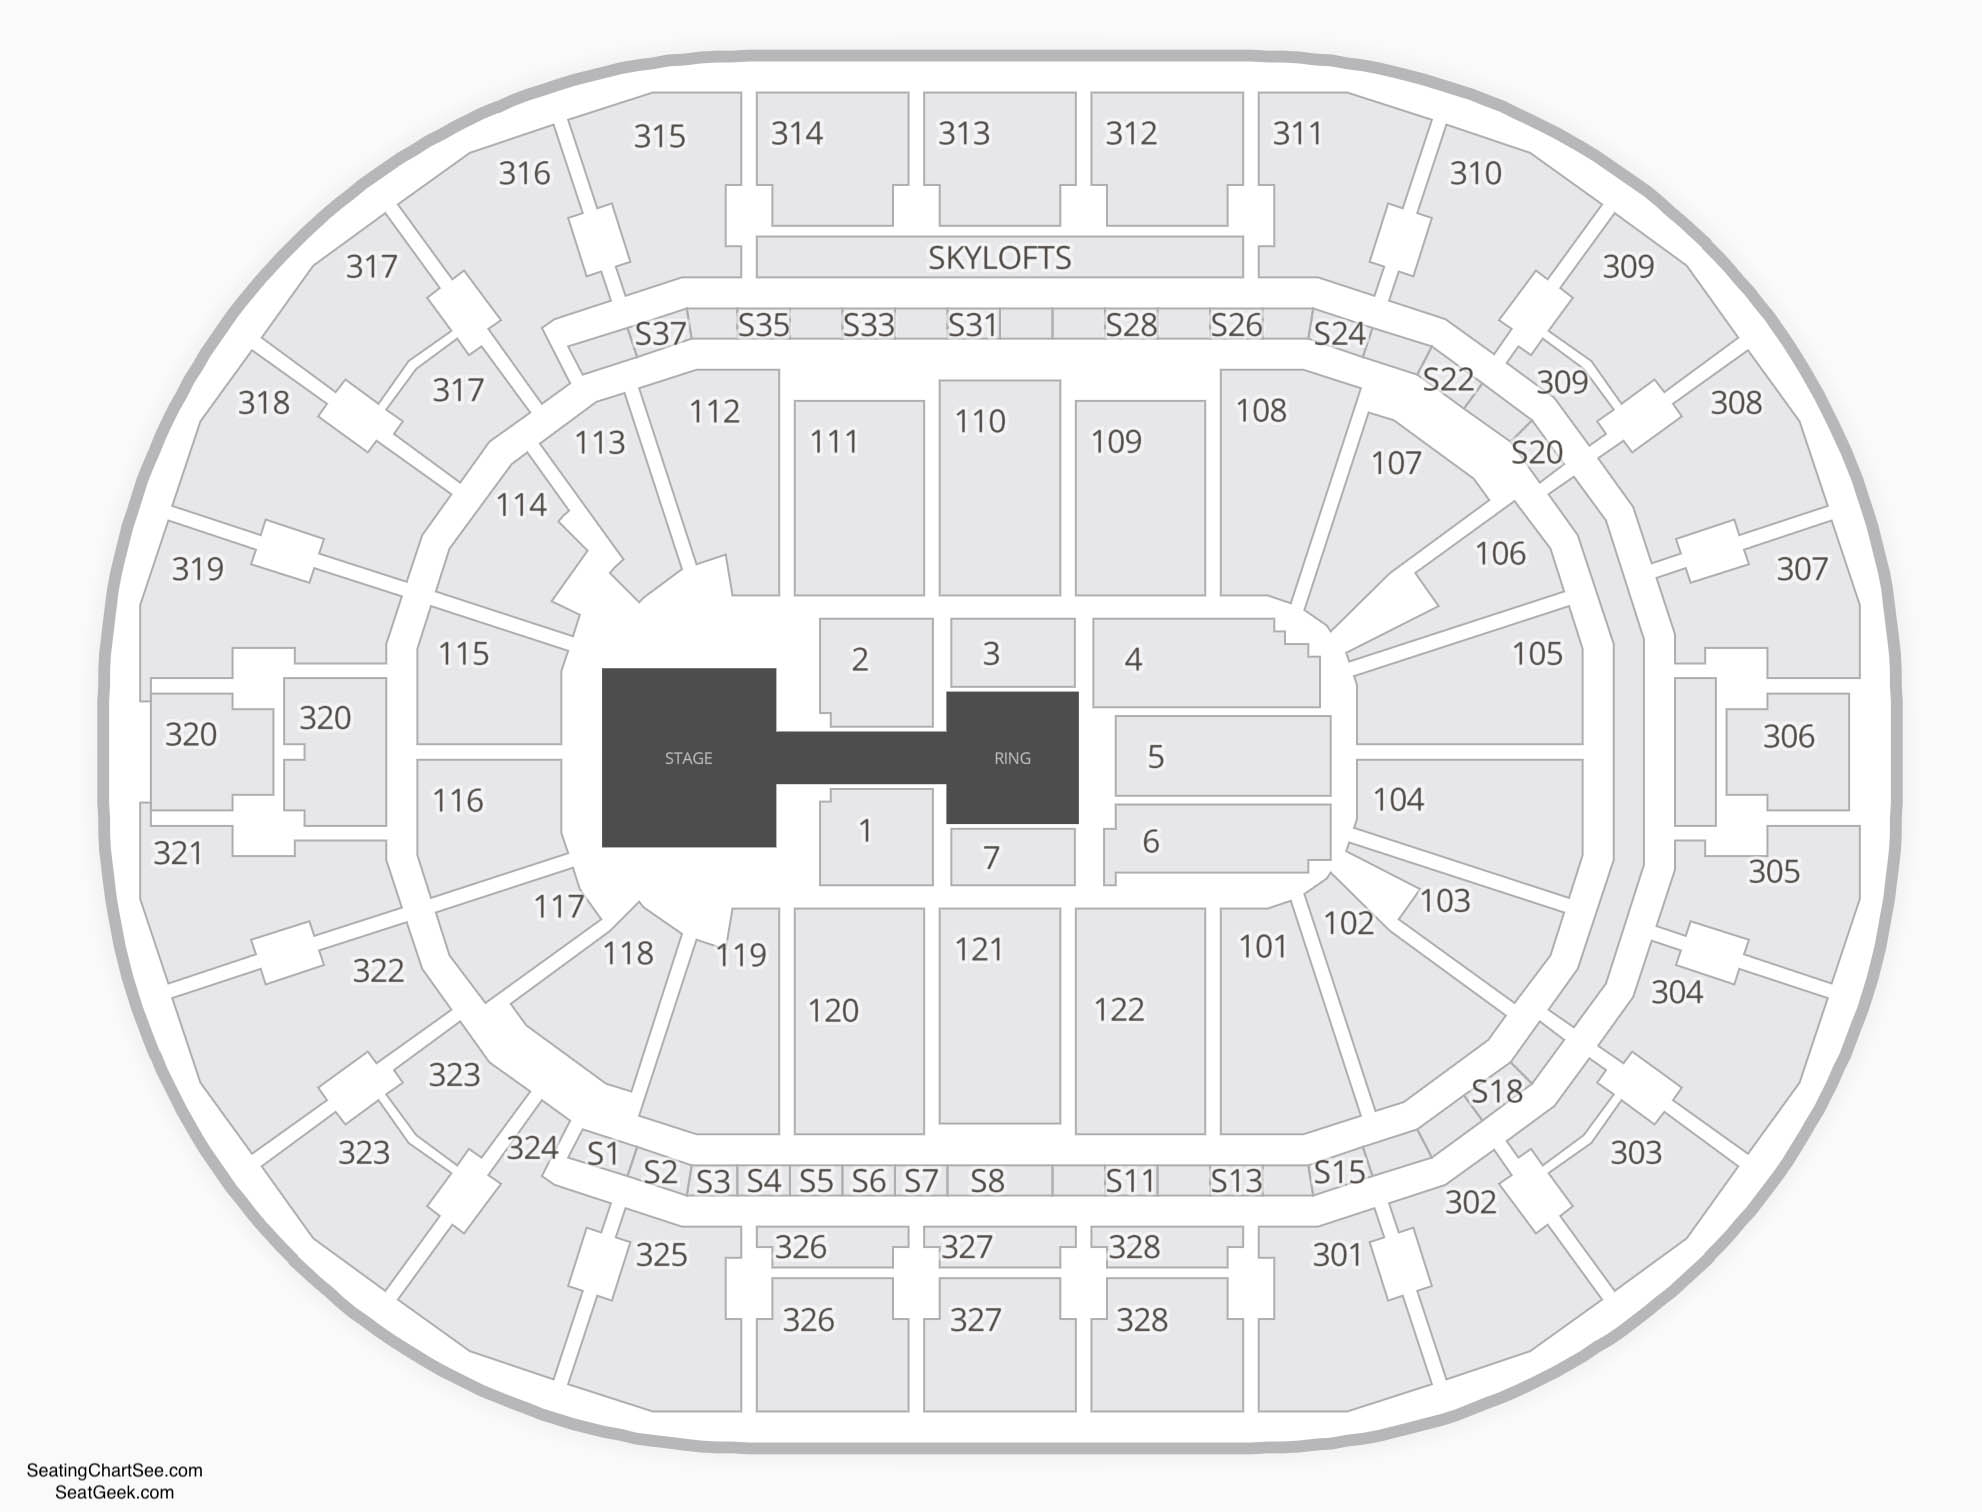 BOK Center Wwe Seating Chart